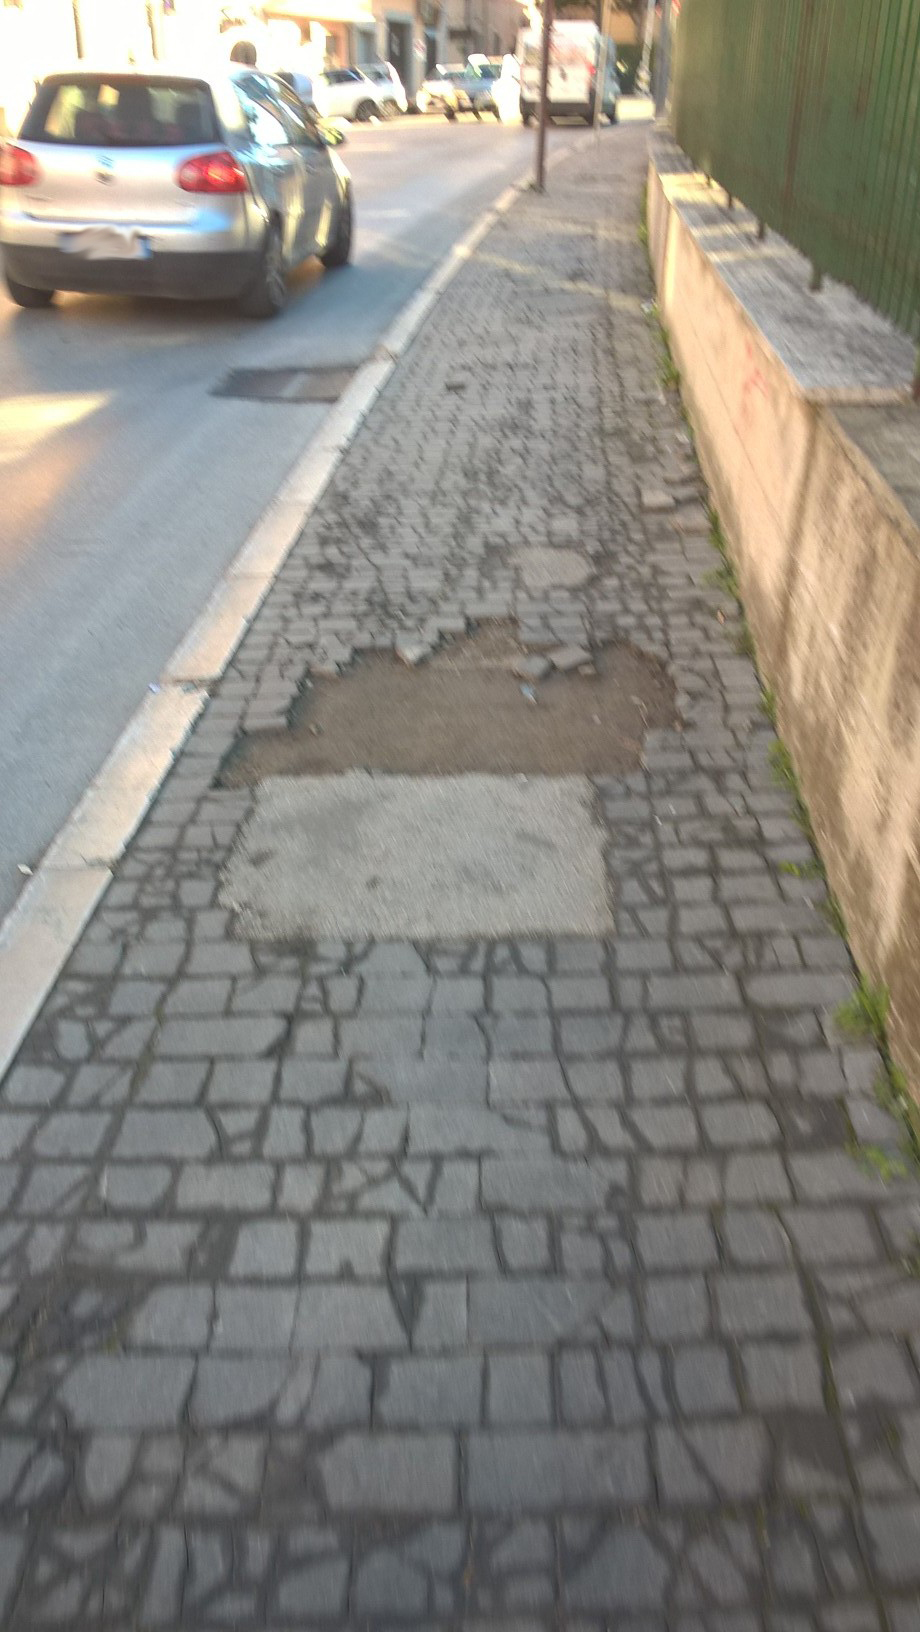 Strade e marciapiedi, si accelera